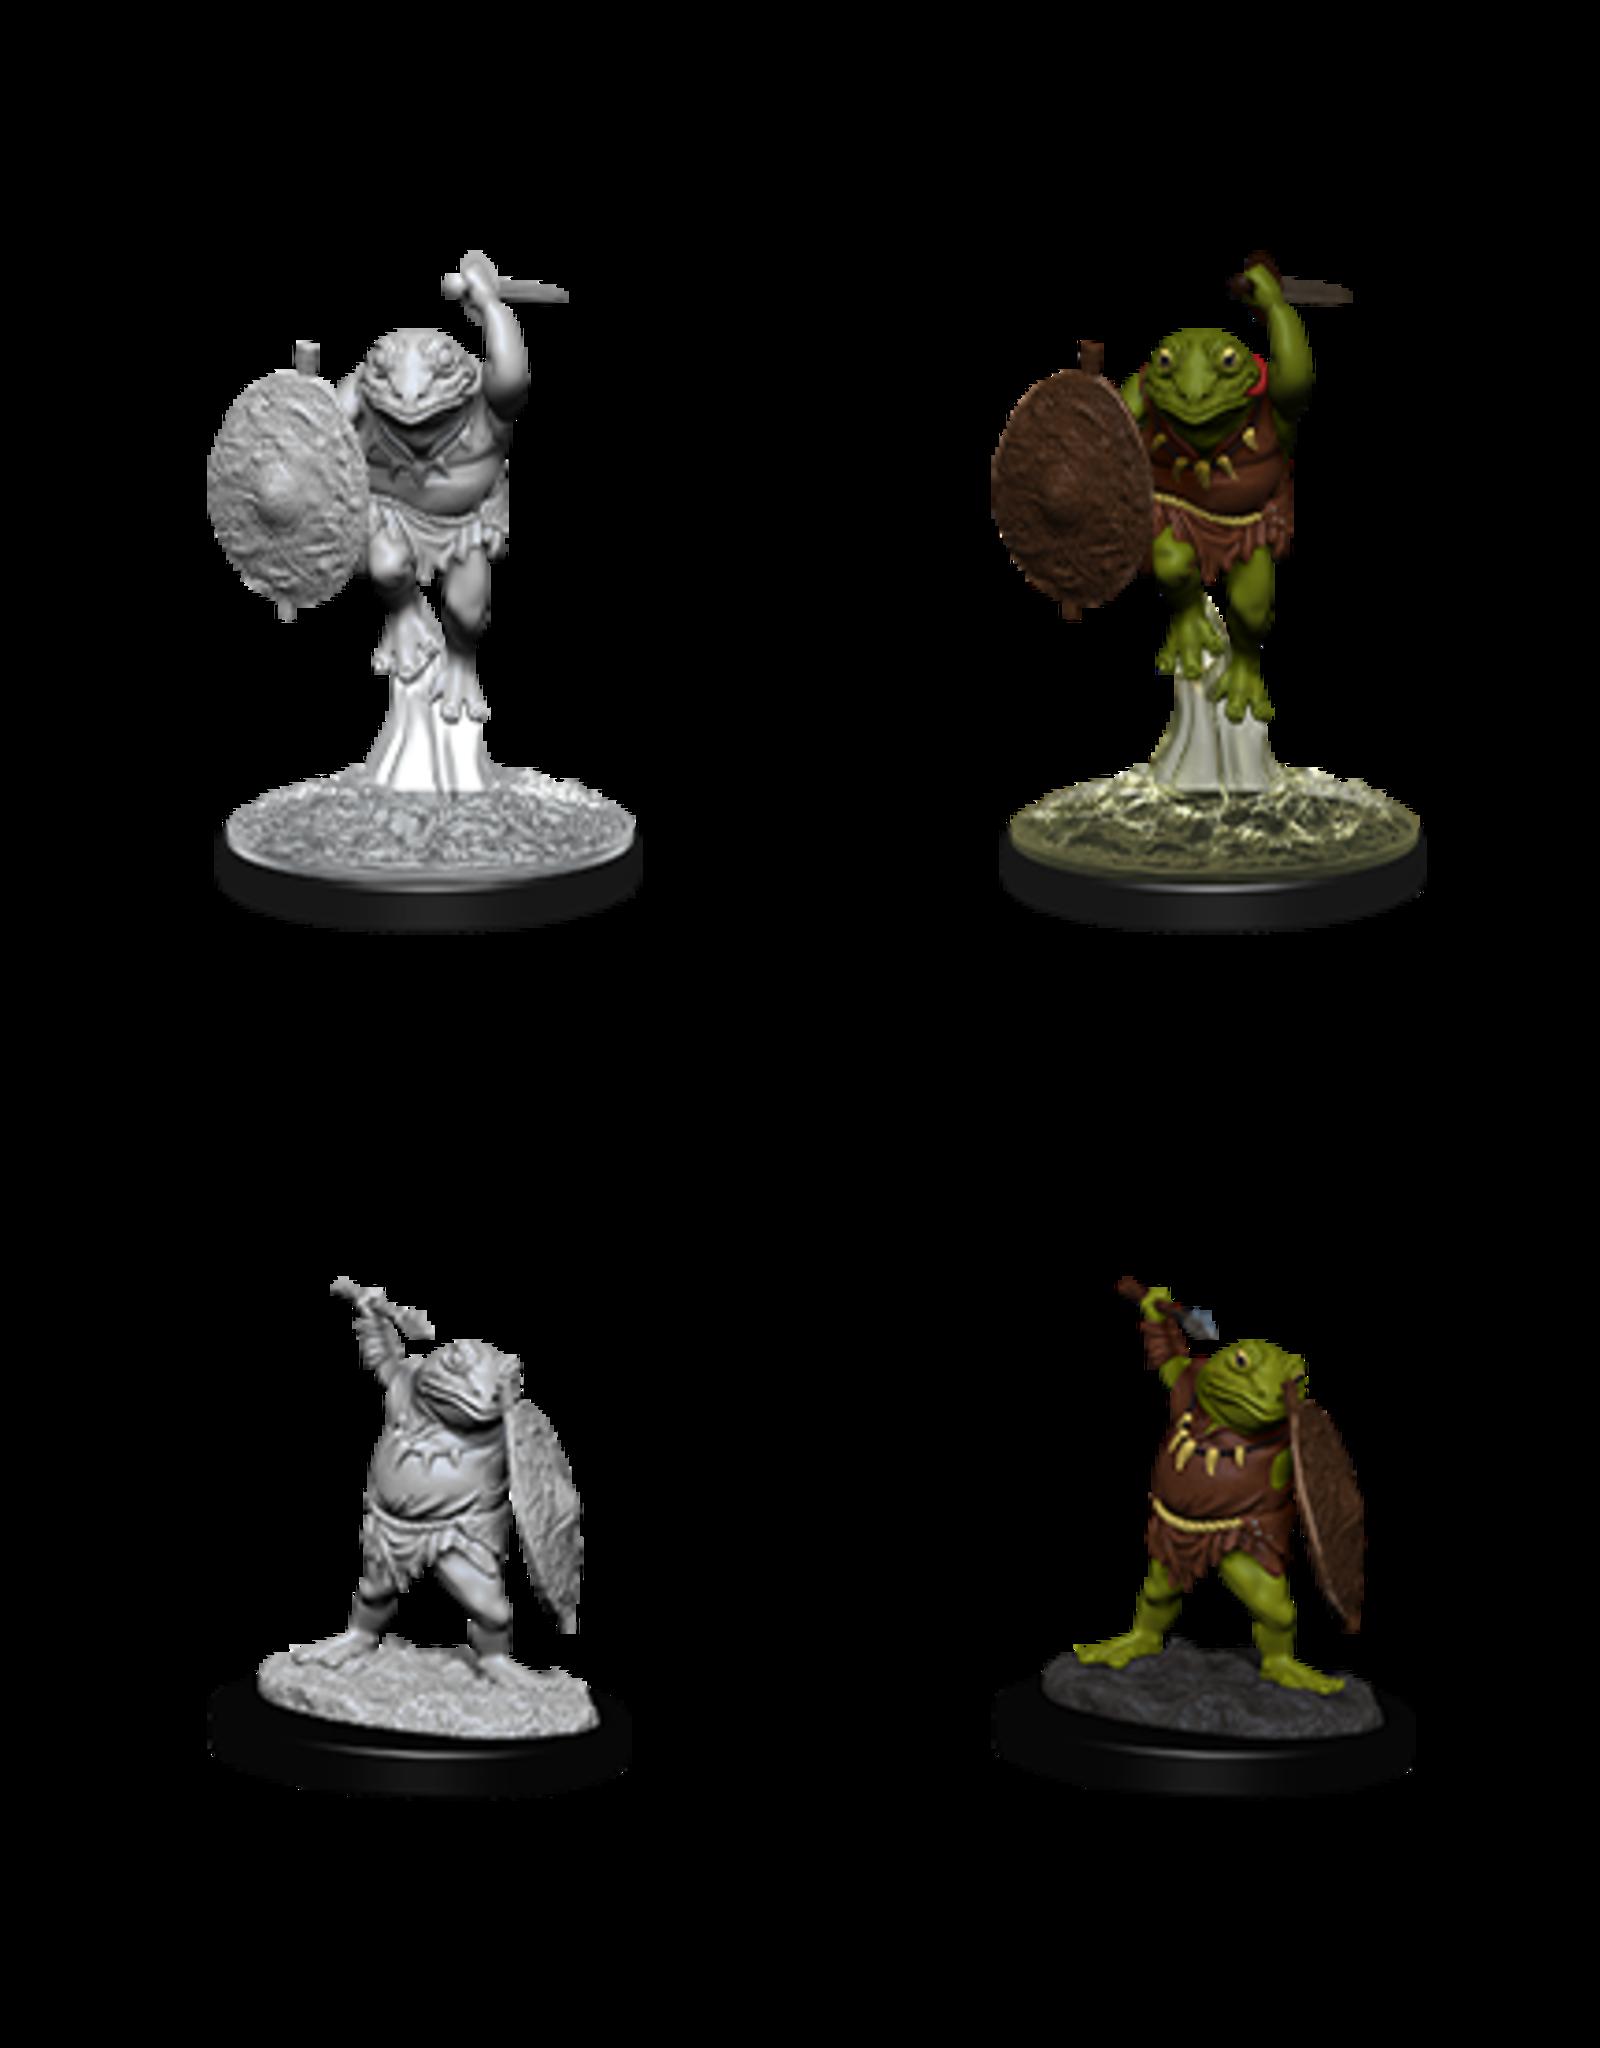 Nolzur's Marvelous Miniatures D&D D&D NMU - Bullywug (W12)